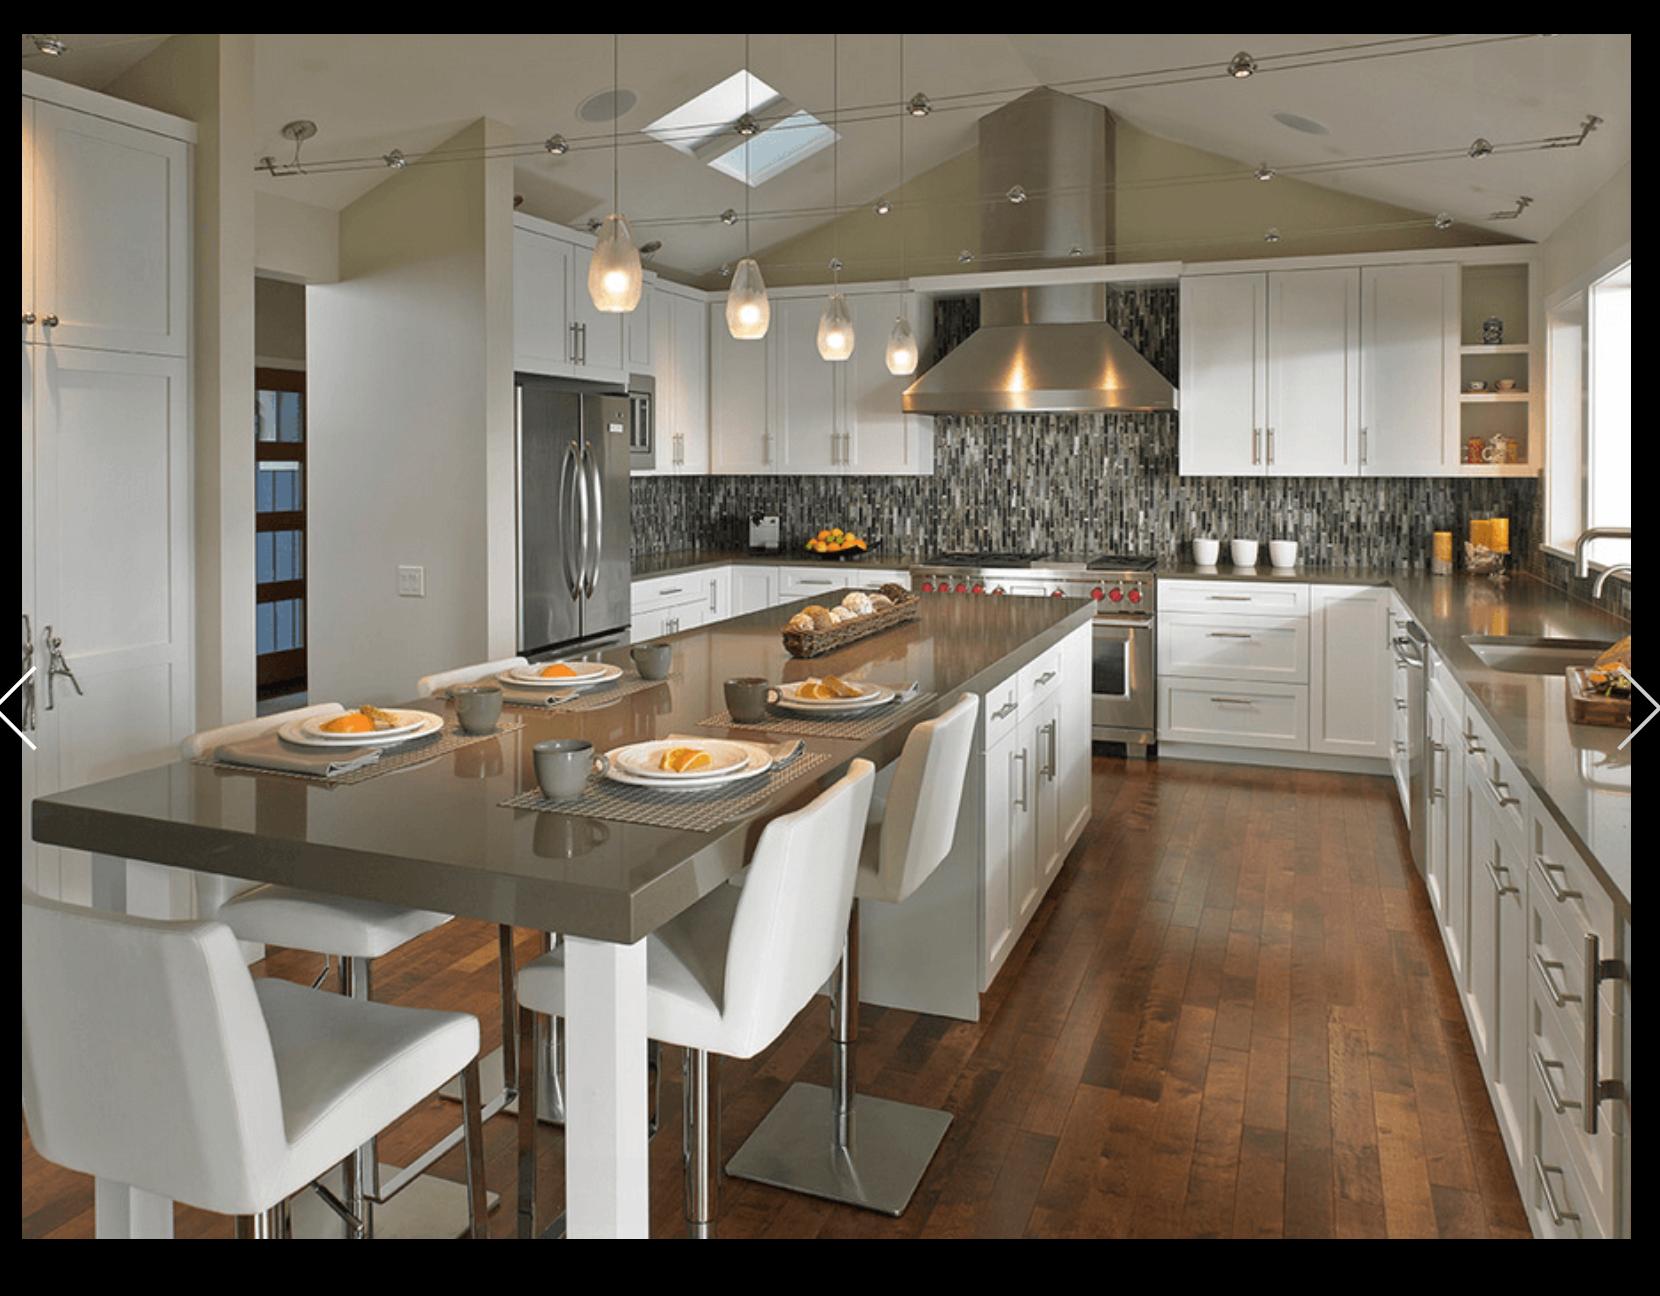 Isla Mesa Decoracion De Cocina Decoracion De Cocina Moderna Cocinas De Casa